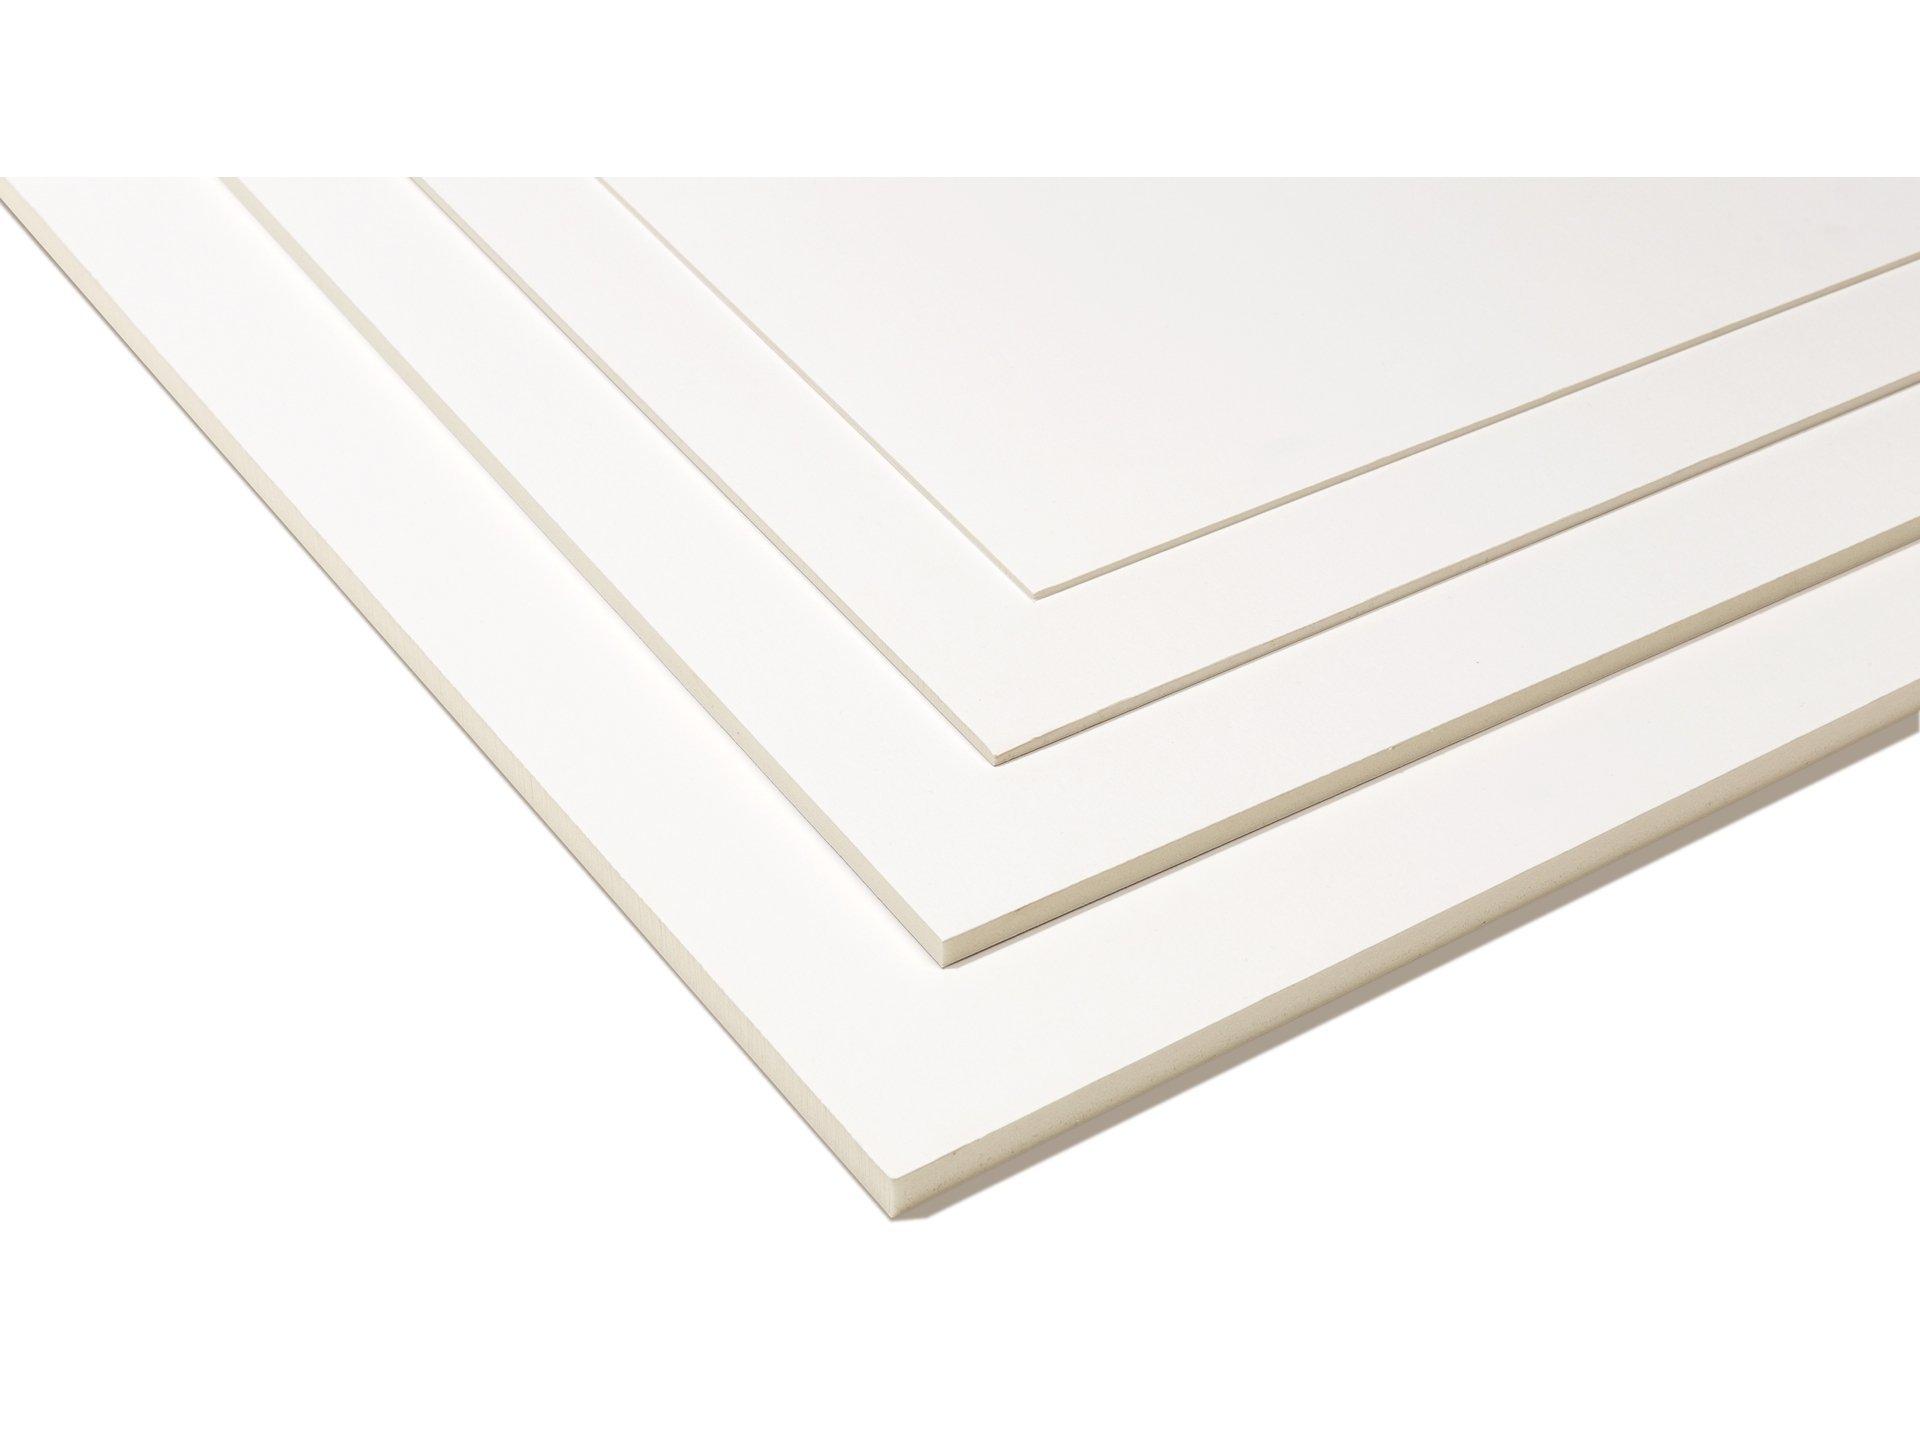 kapa line kartonkaschiert wei kaufen modulor. Black Bedroom Furniture Sets. Home Design Ideas